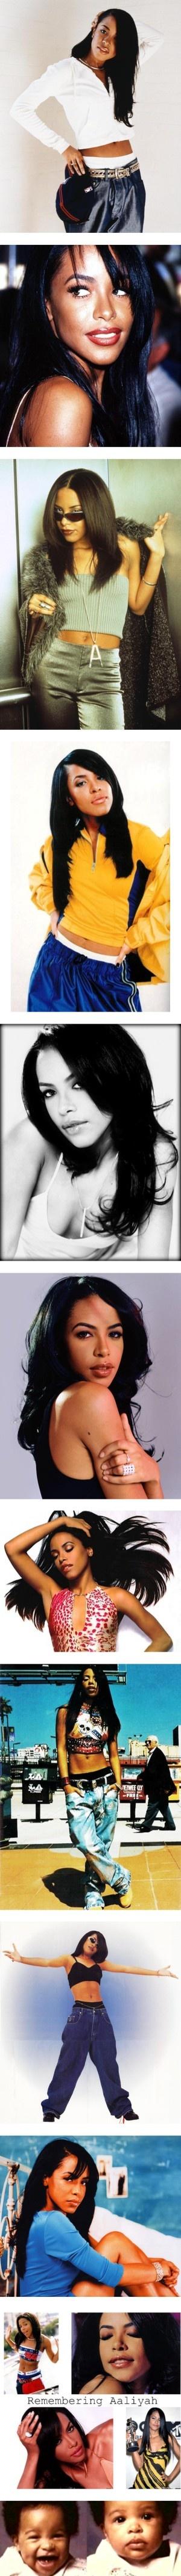 """Aaliyah Dana Haughton"" by rio-anon ❤ liked on Polyvore@Felicia G Fletcher"